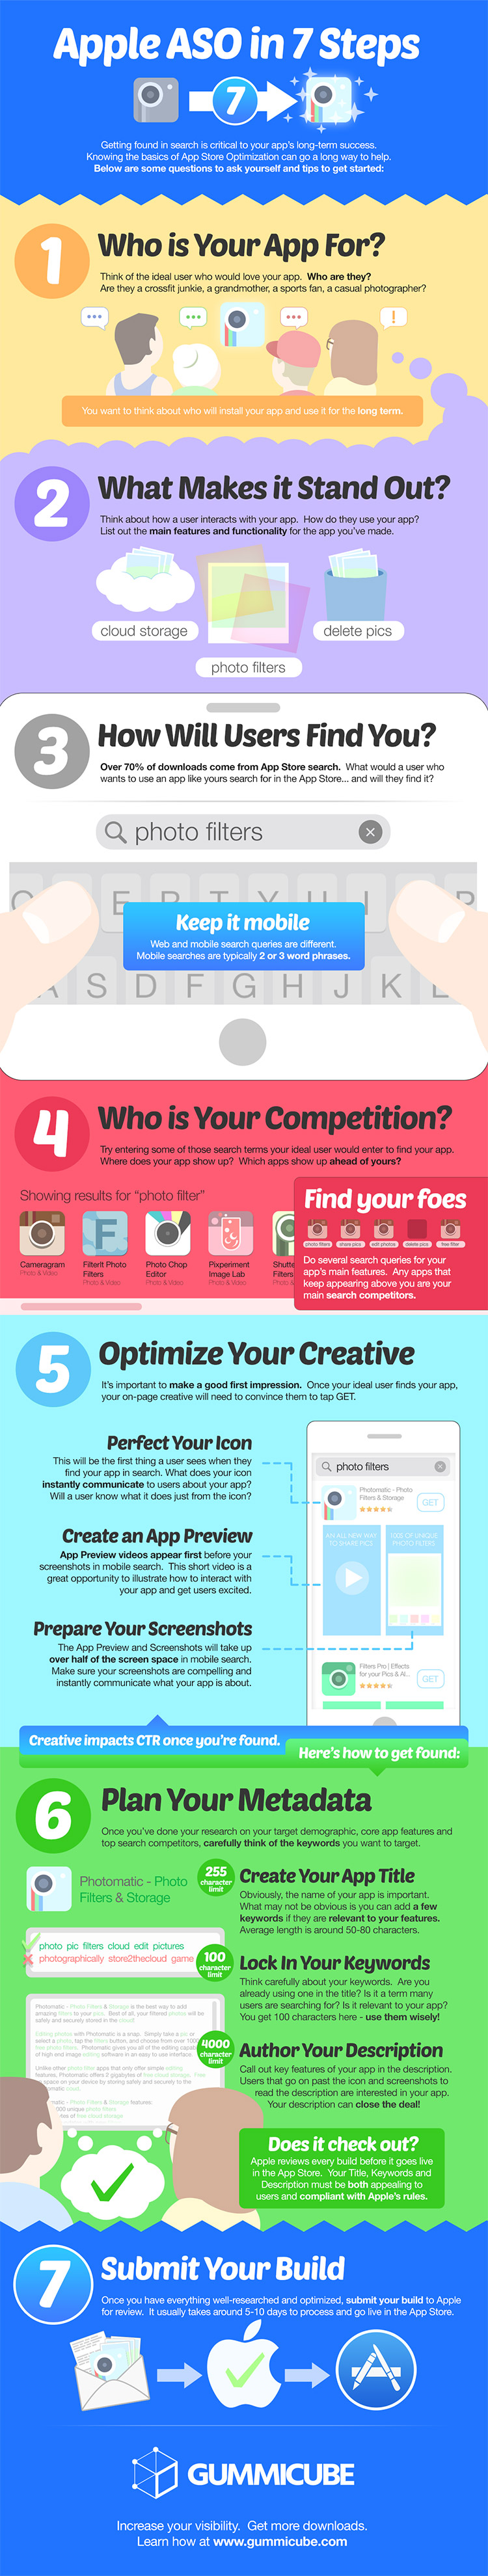 Apple Aso In 7 Steps Infographic App Marketing Optimization App